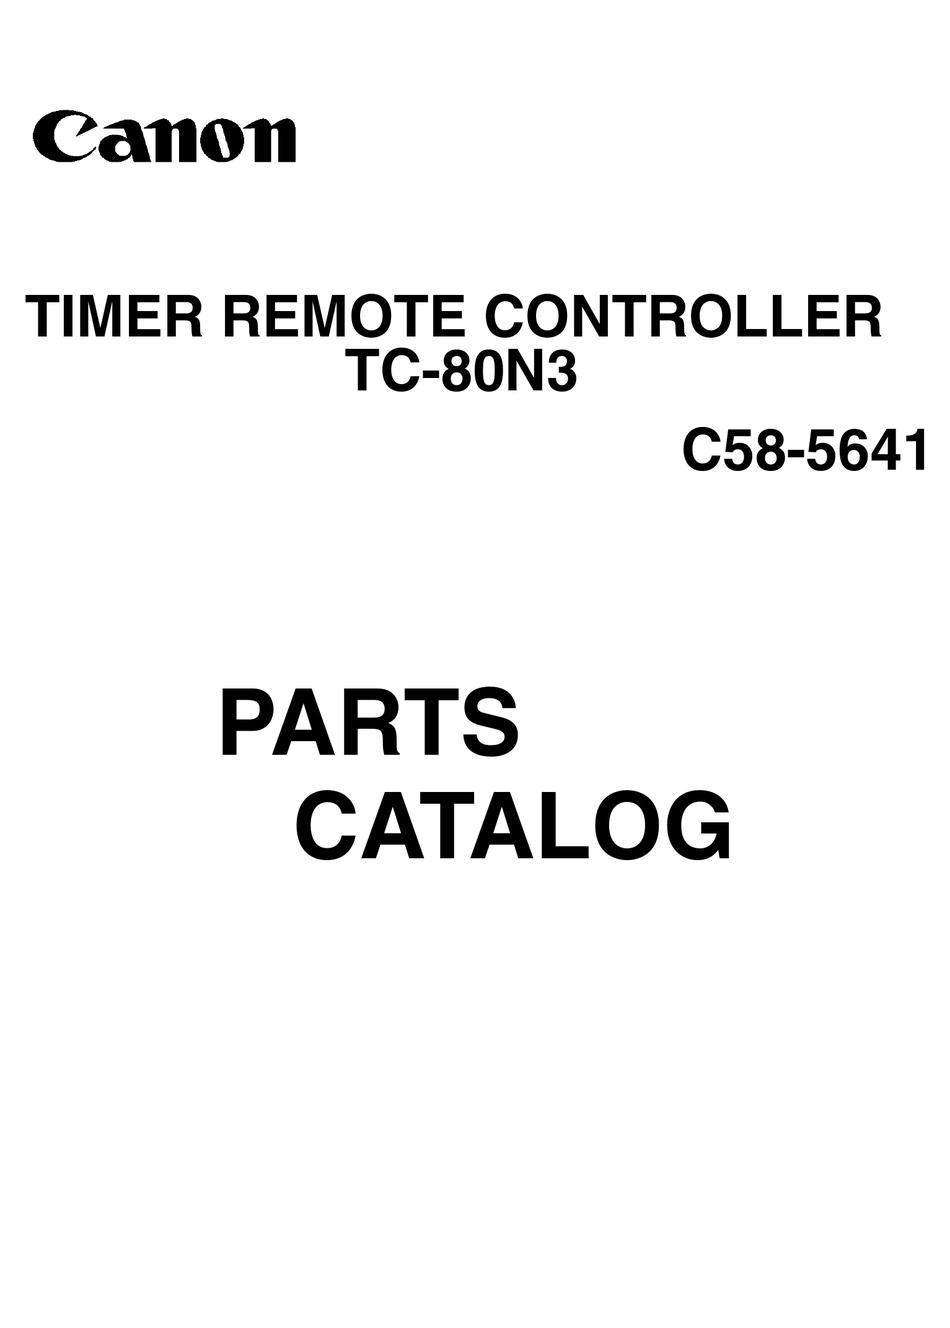 CANON TIMER REMOTE CONTROLLER TC-80N3 PARTS CATALOG Pdf